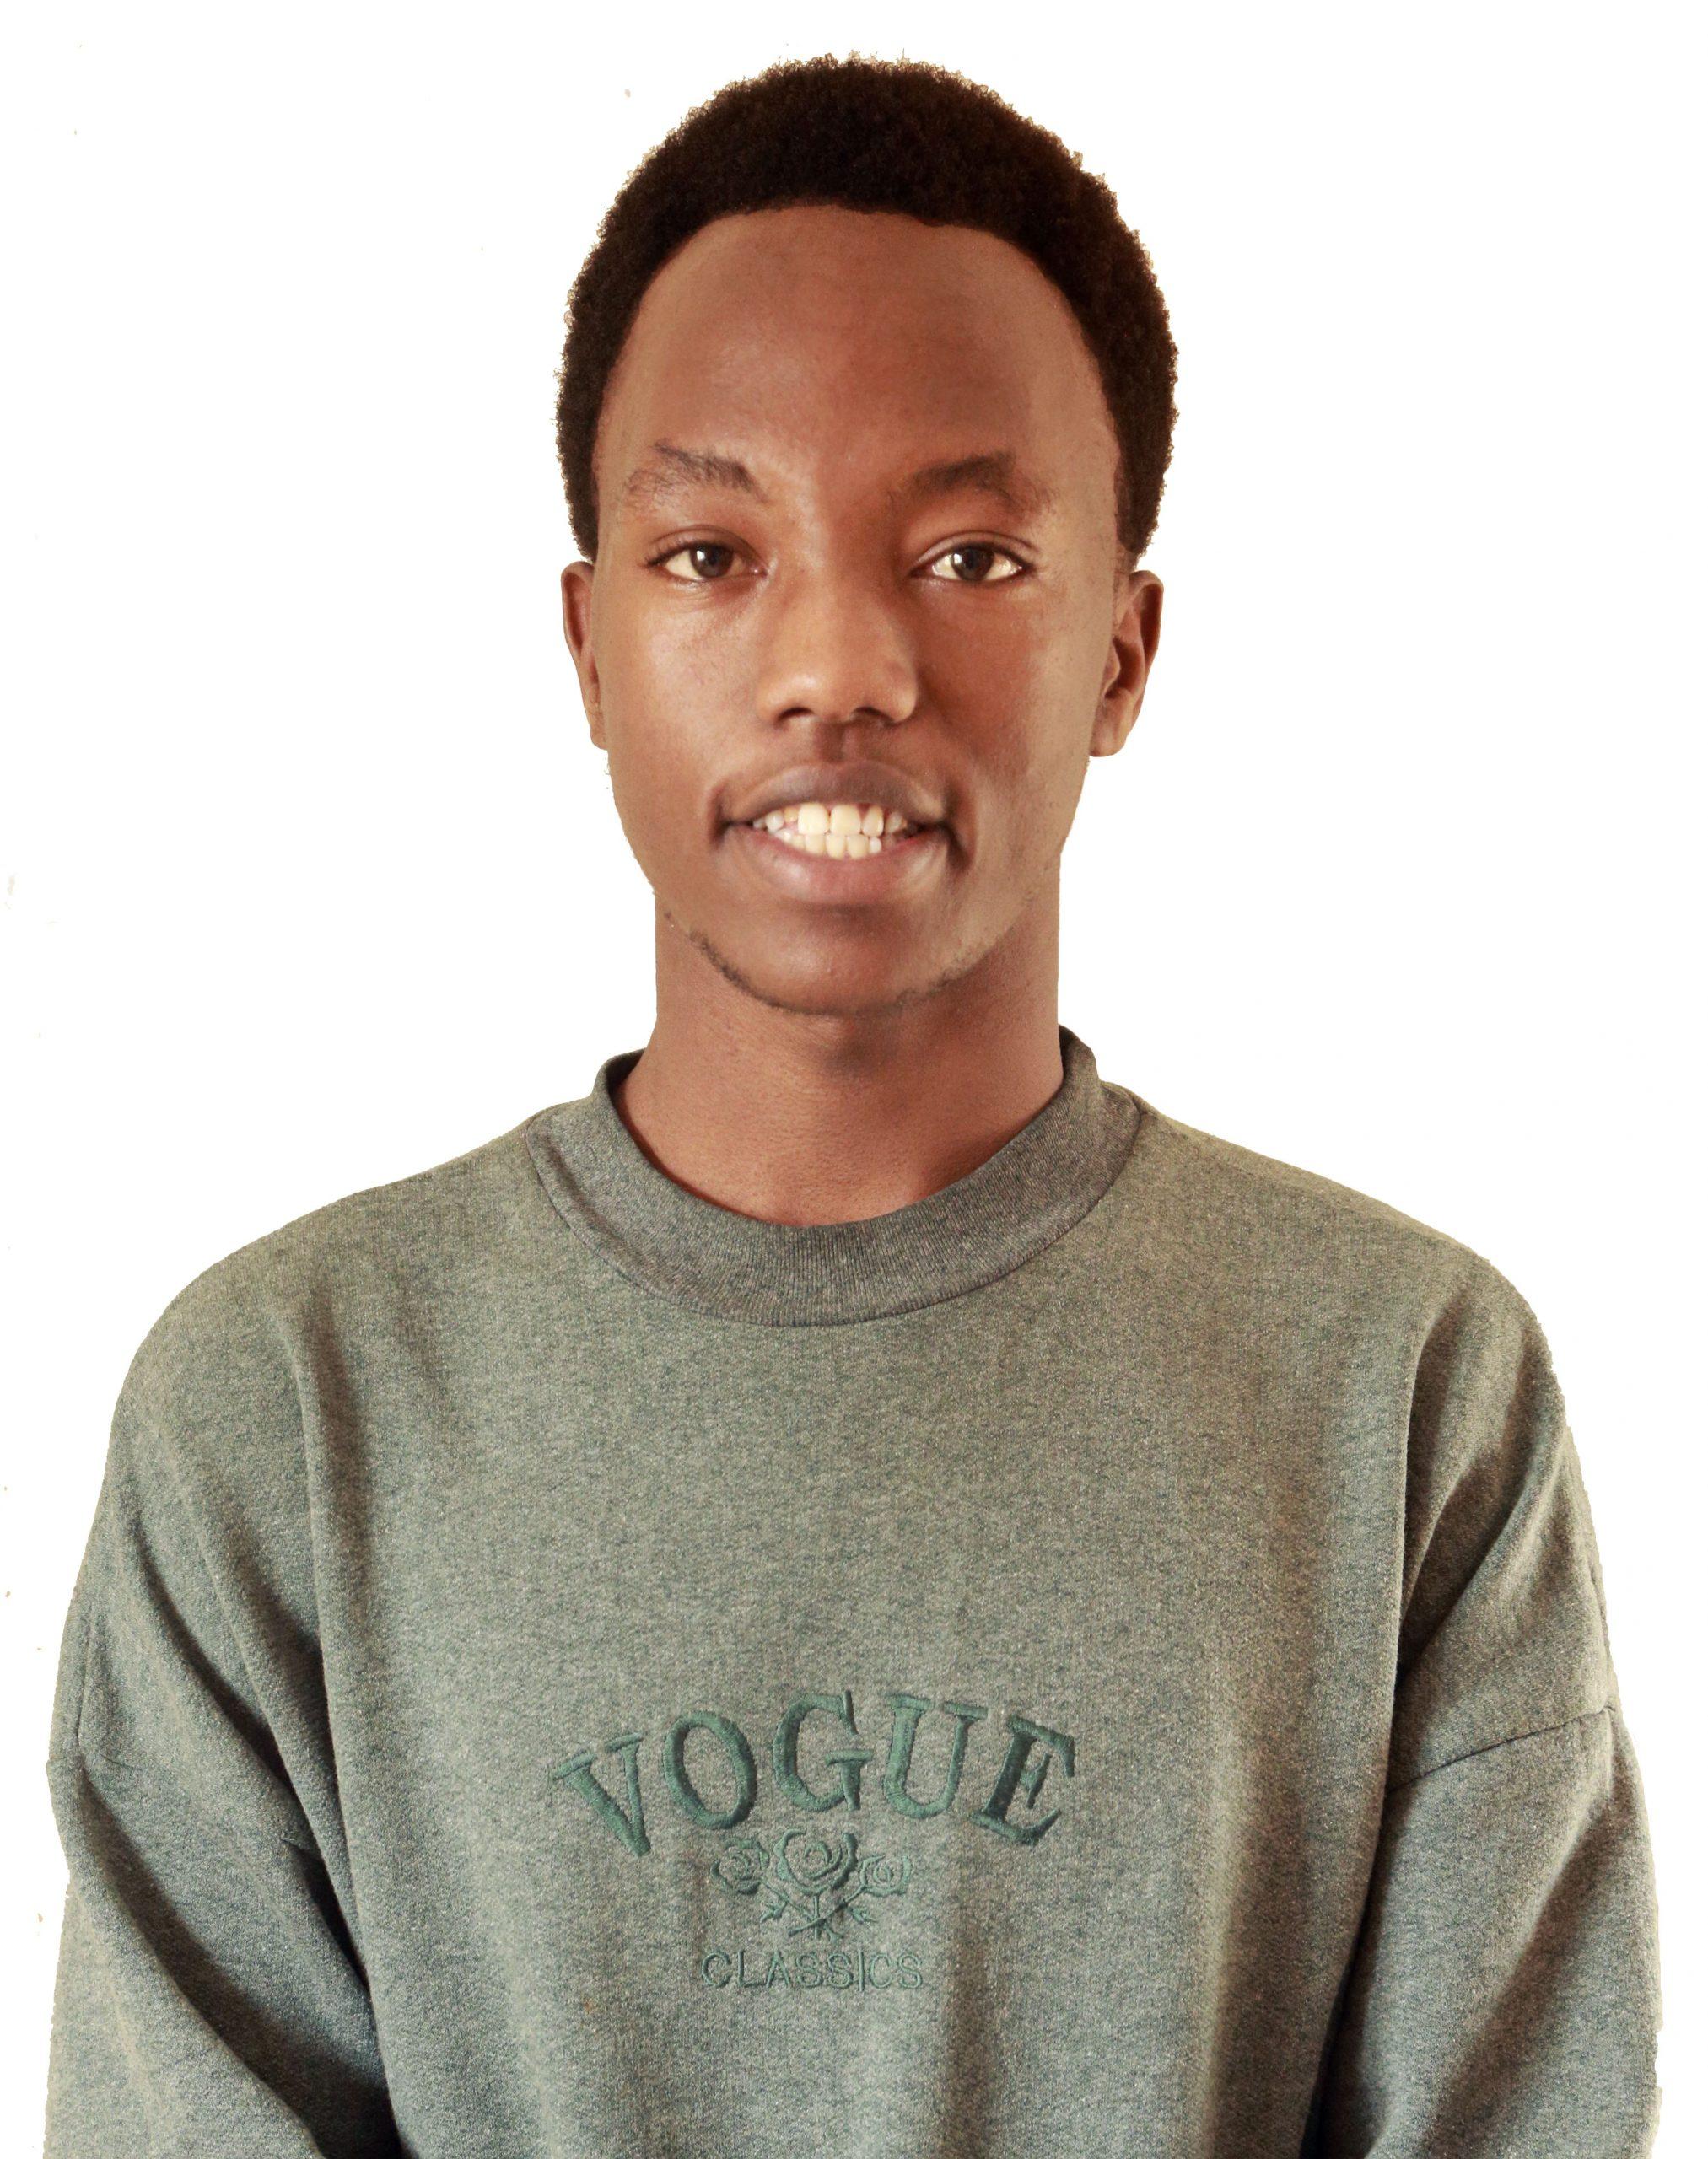 Tom Patrick Nzabonimpa